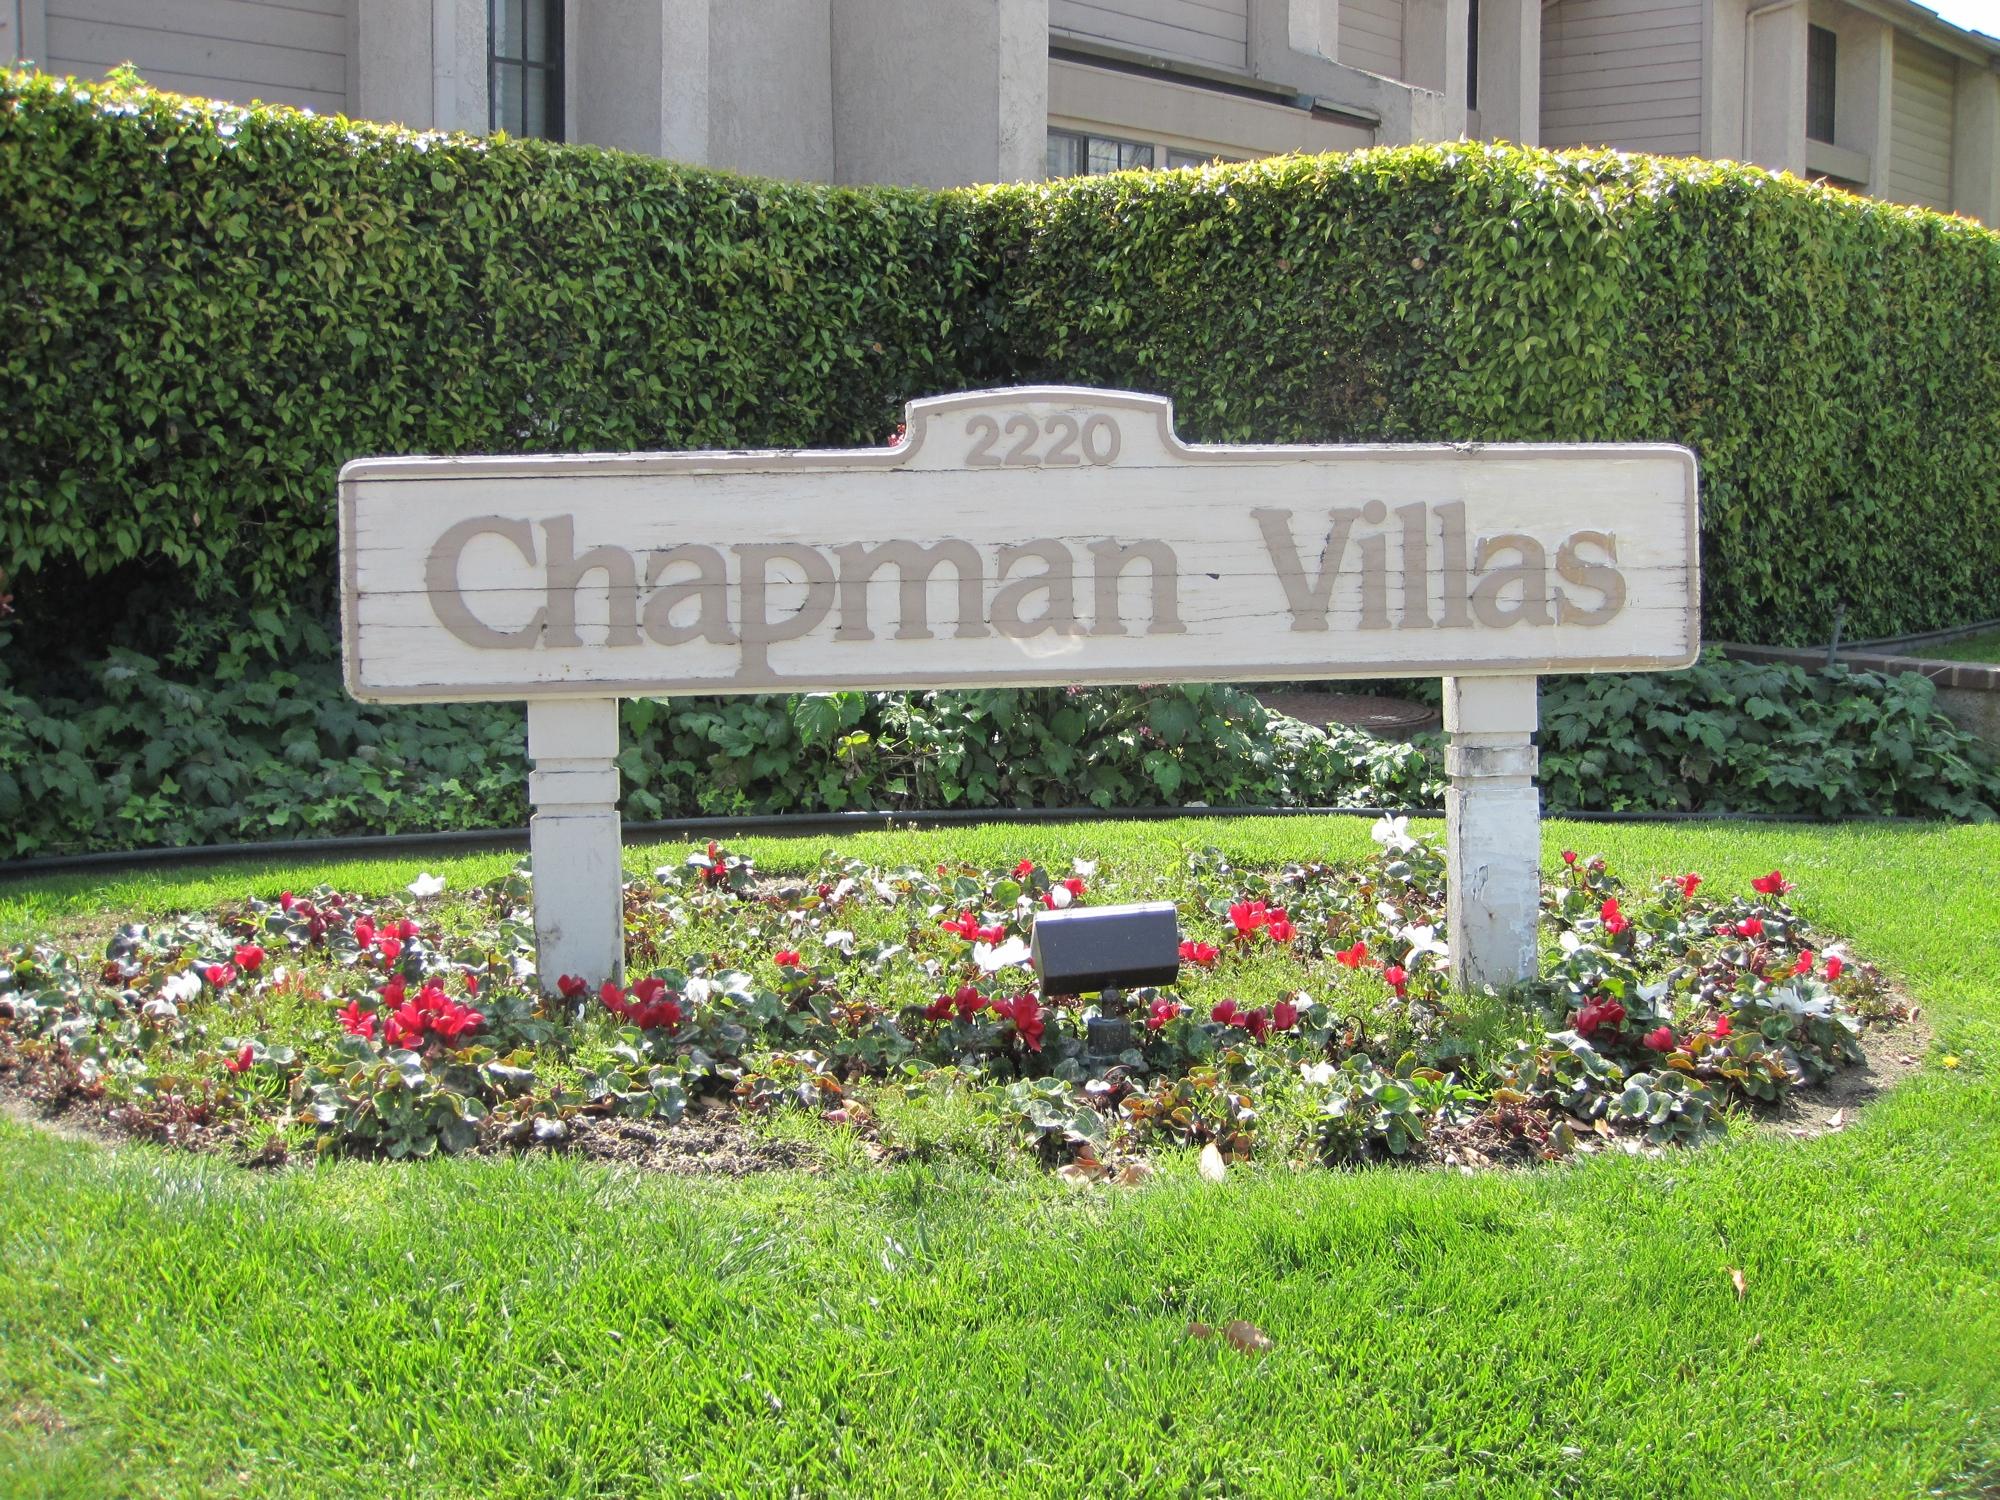 Chapman Villas